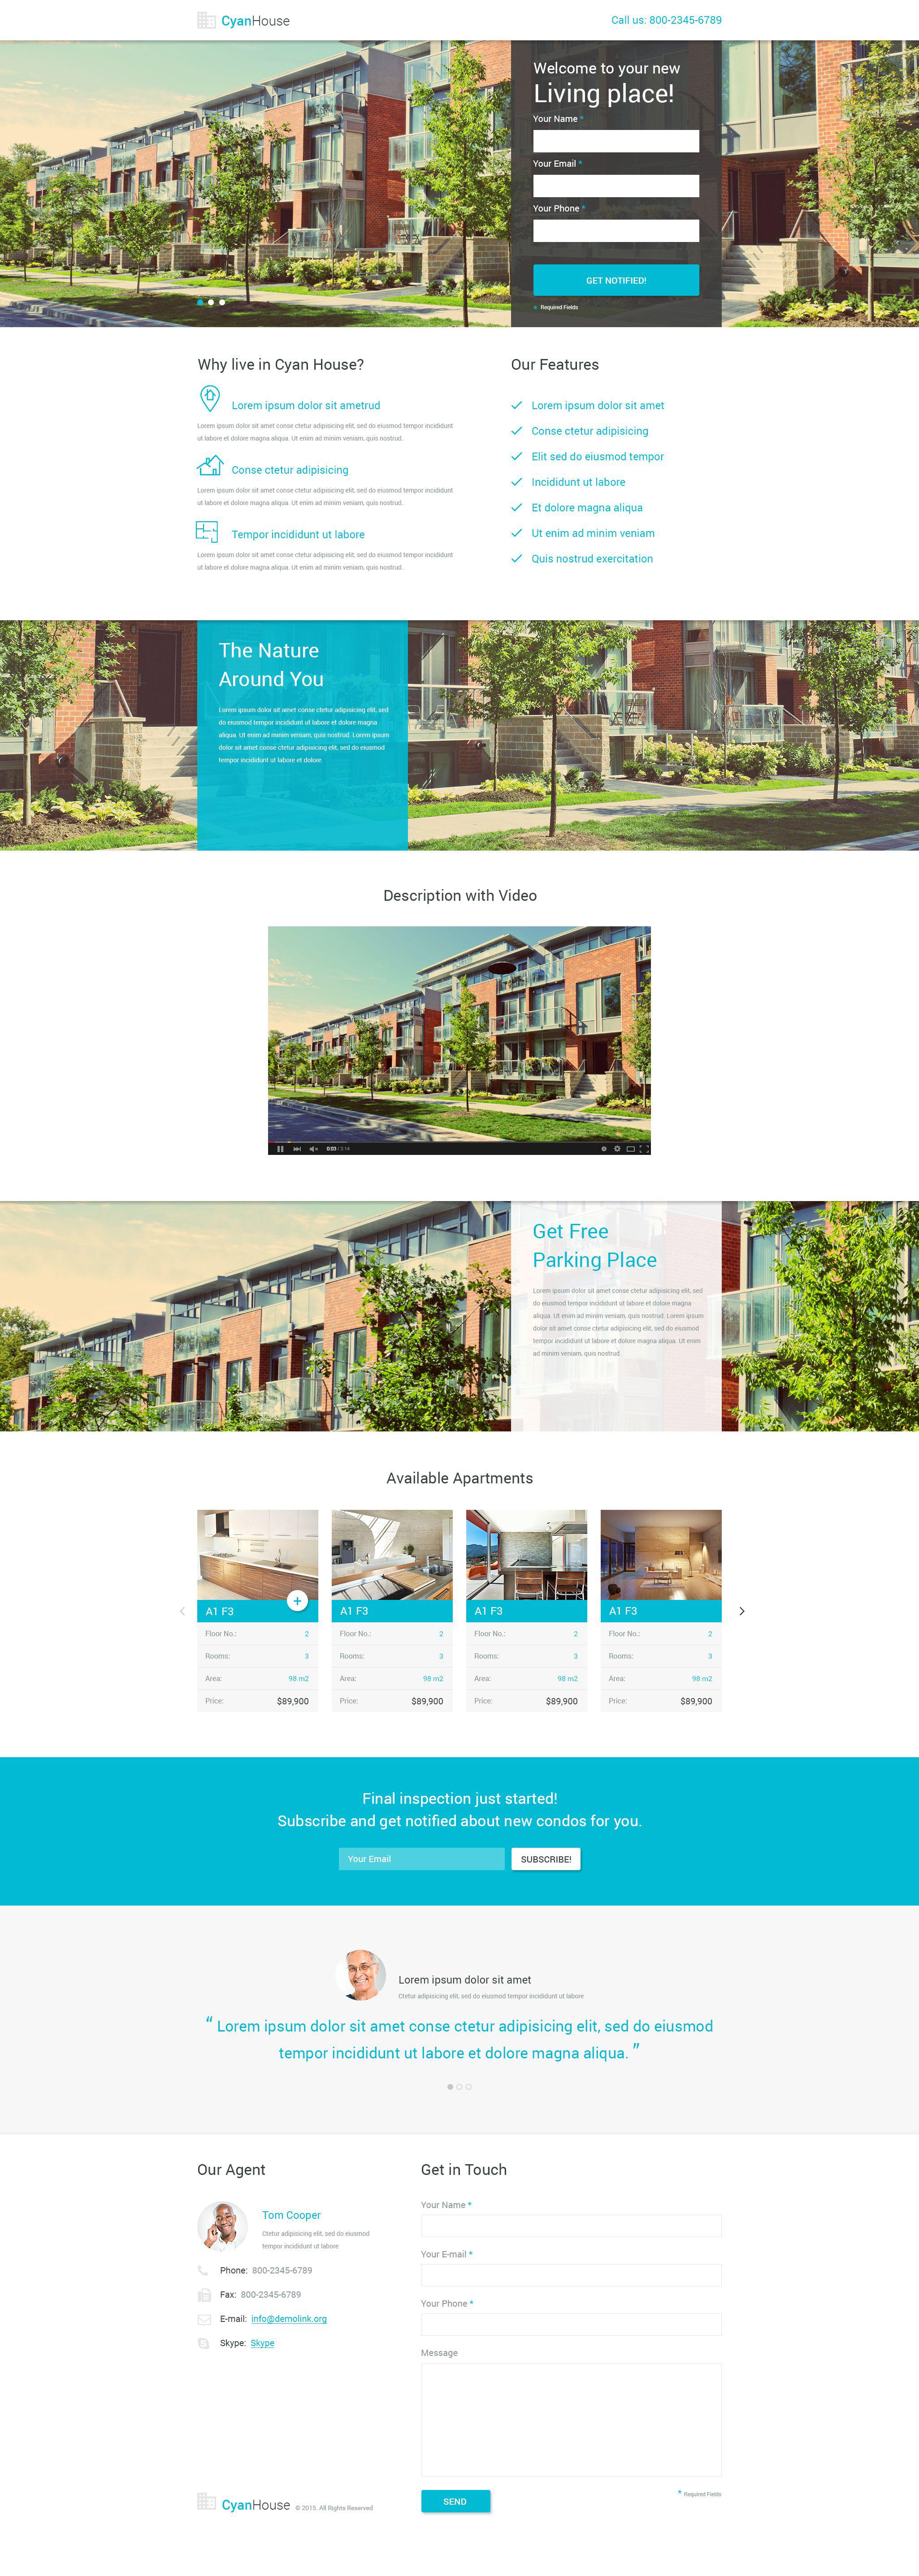 Real Estate PSD Template - screenshot